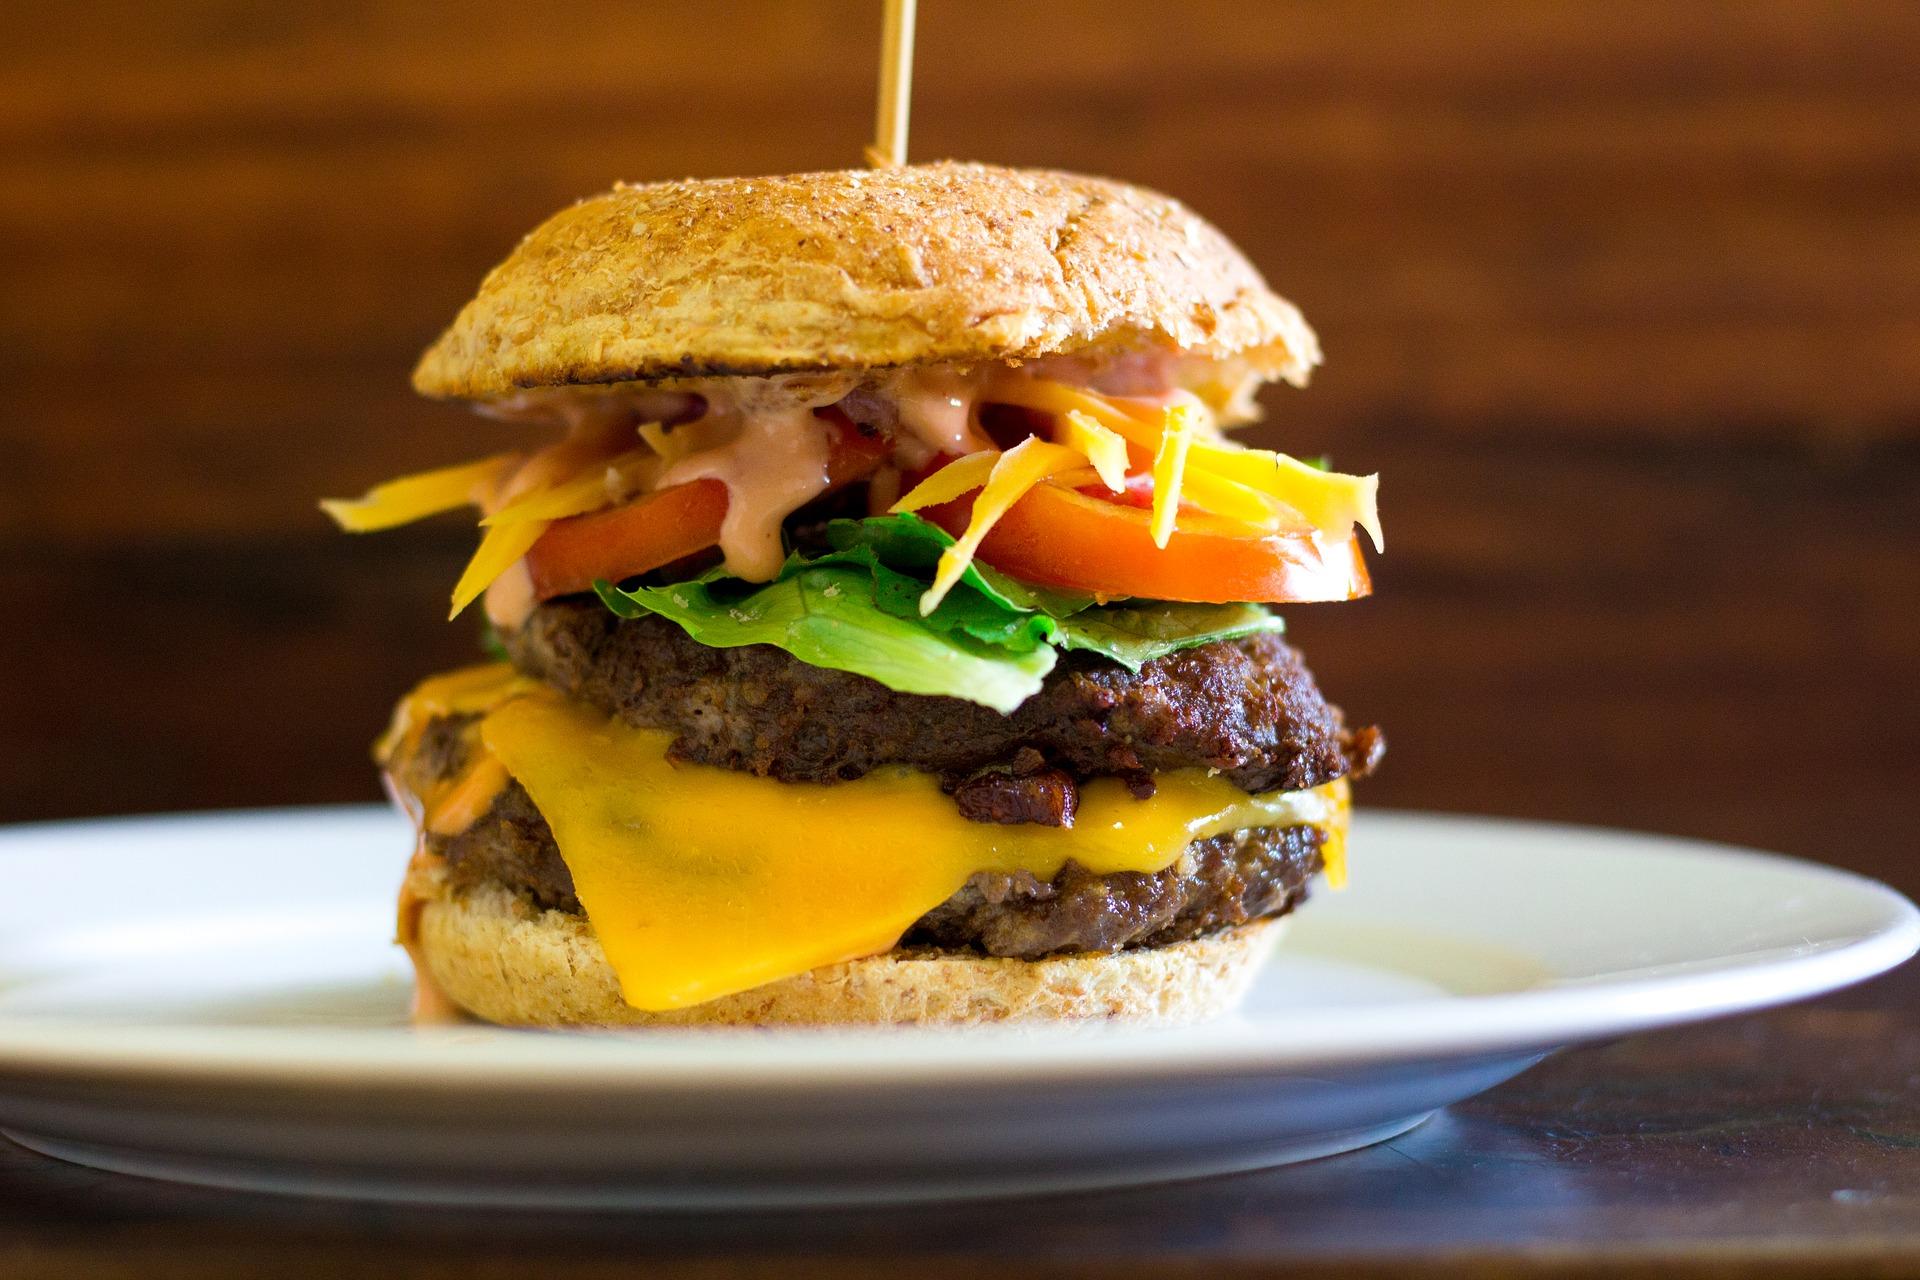 https://m.wm.pl/2020/08/orig/burger-4152013-1920-644251.jpg